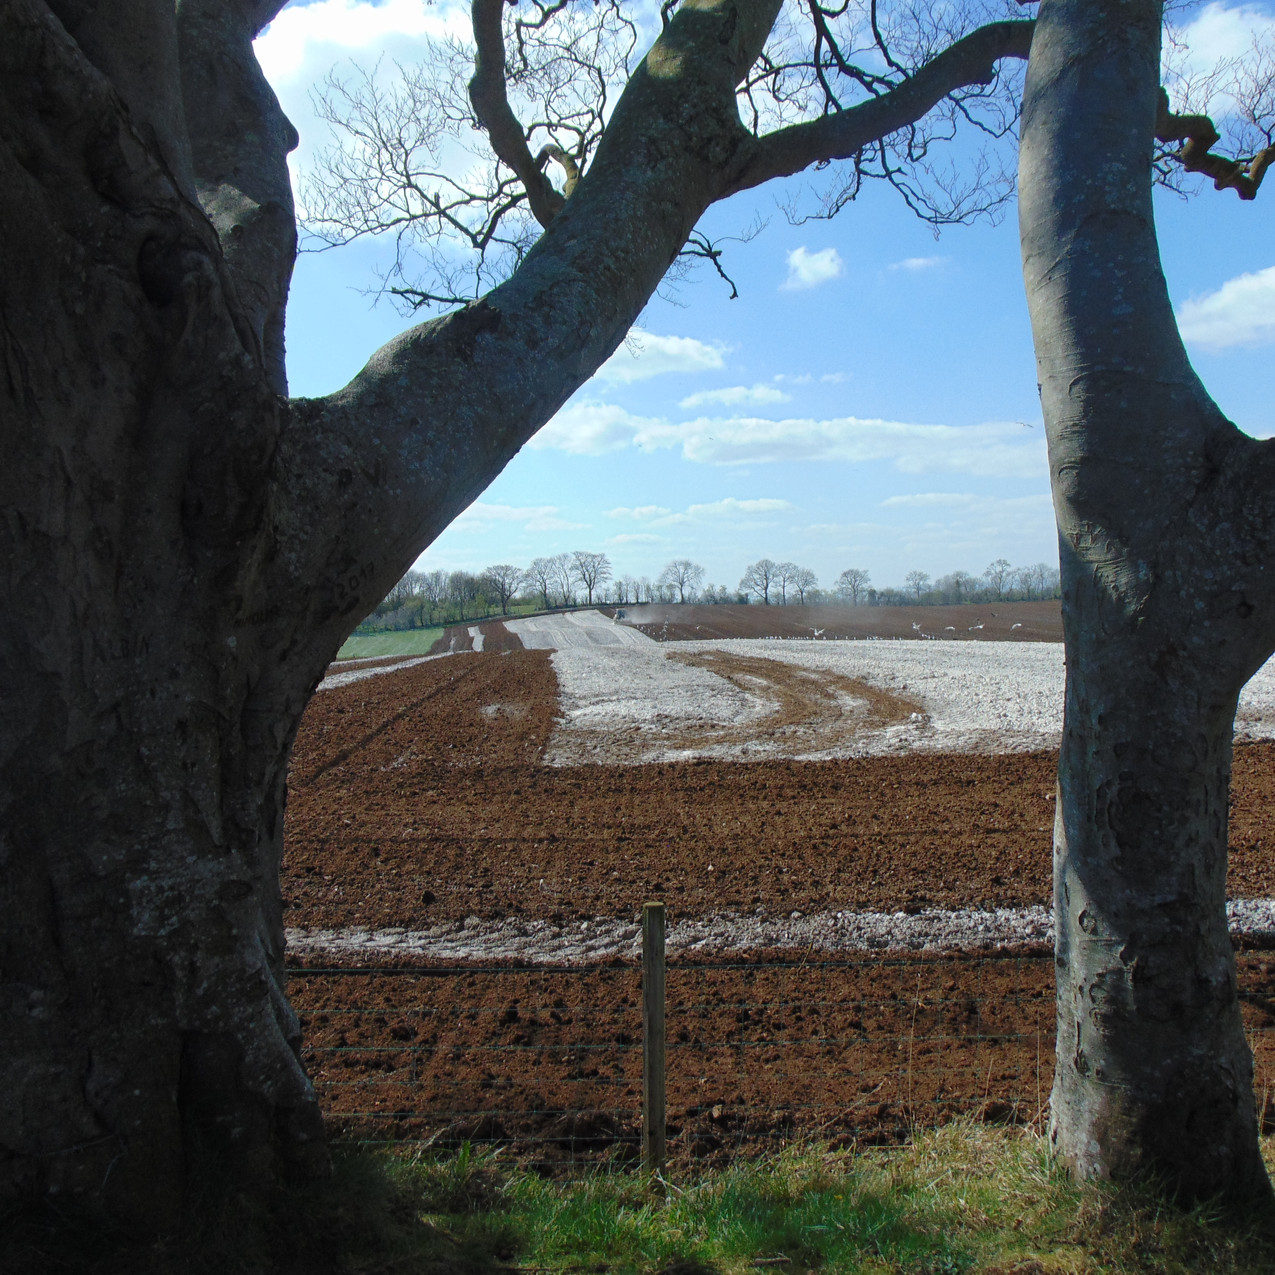 Farmland at The Dark Hedges